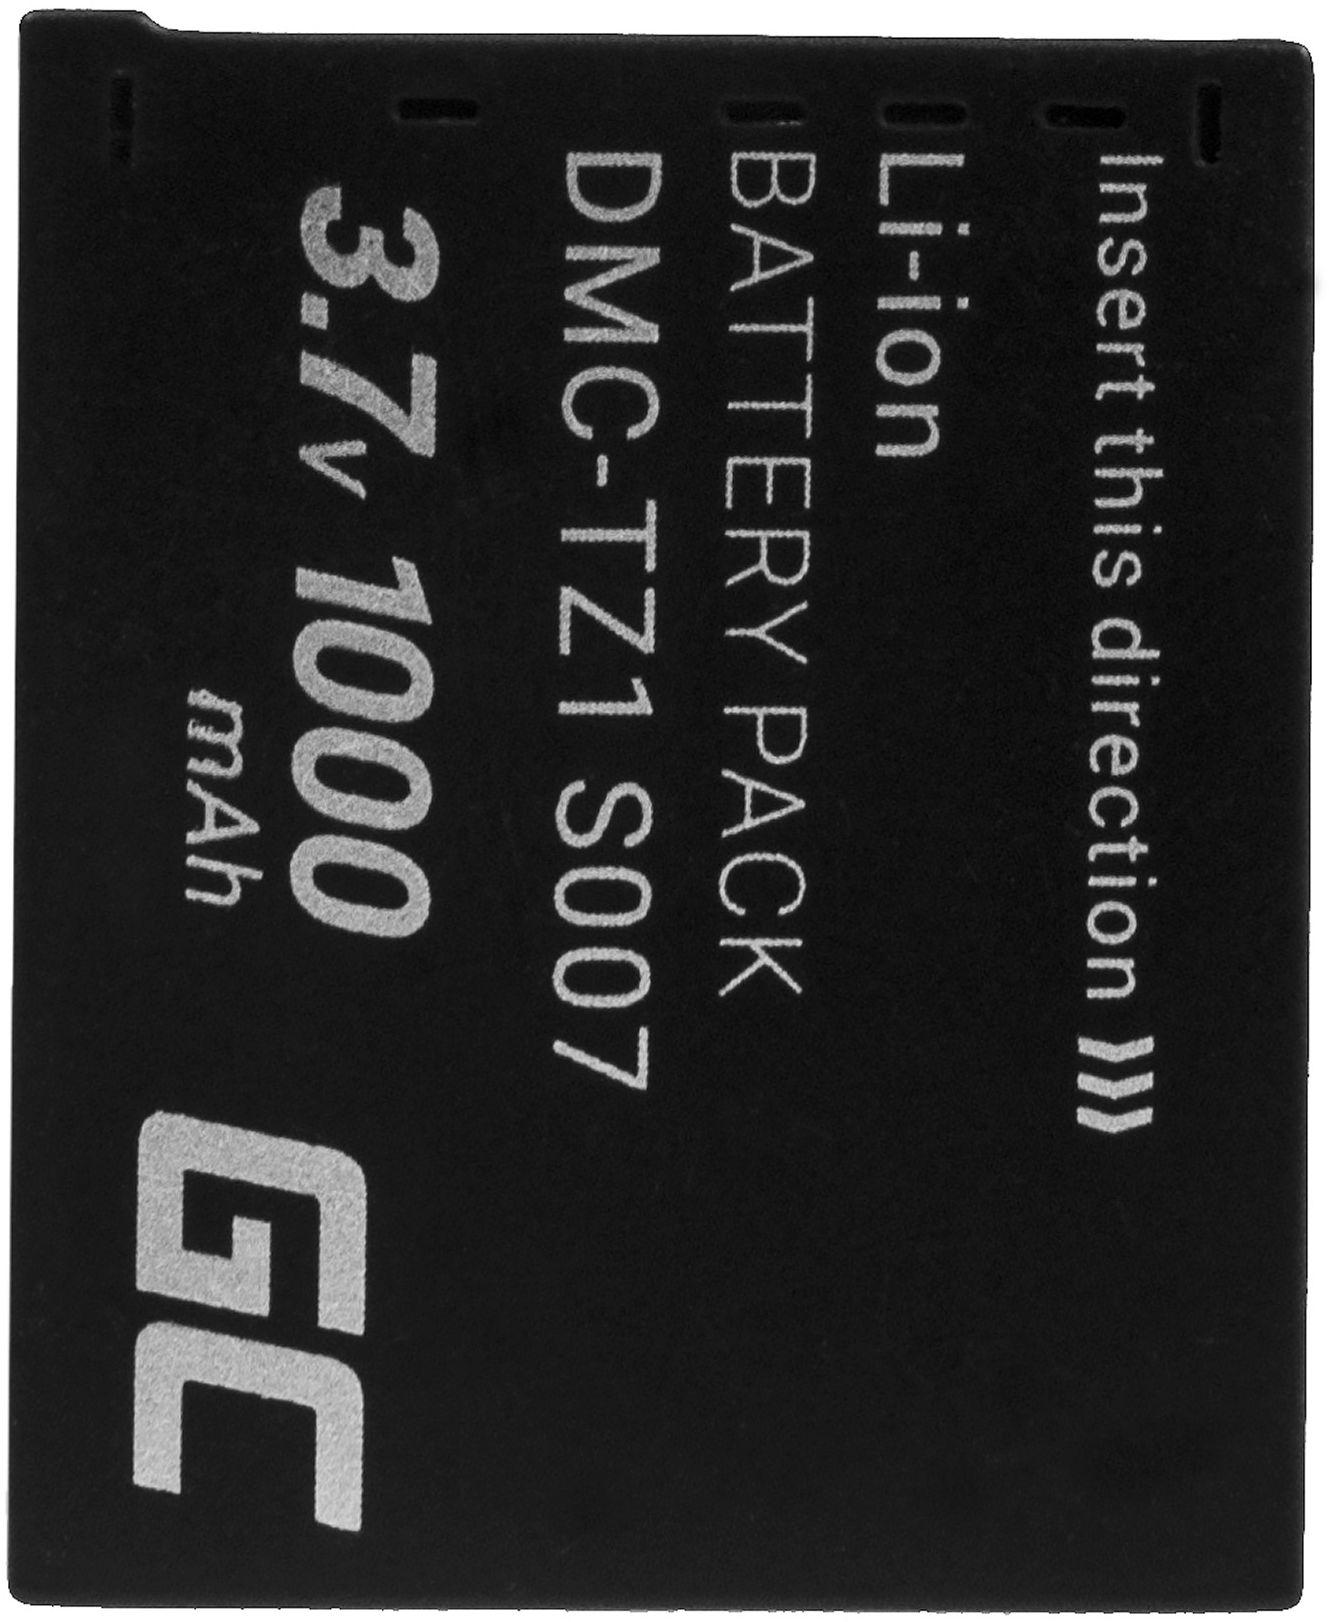 Akumulator Bateria Green Cell  CGA-S007E CGA-S007 do Panasonic Lumix DMC TZ1 TZ2 TZ2GK TZ3 TZ3A TZ3K TZ4 TZ5 TZ11 3.7V 1000mAh